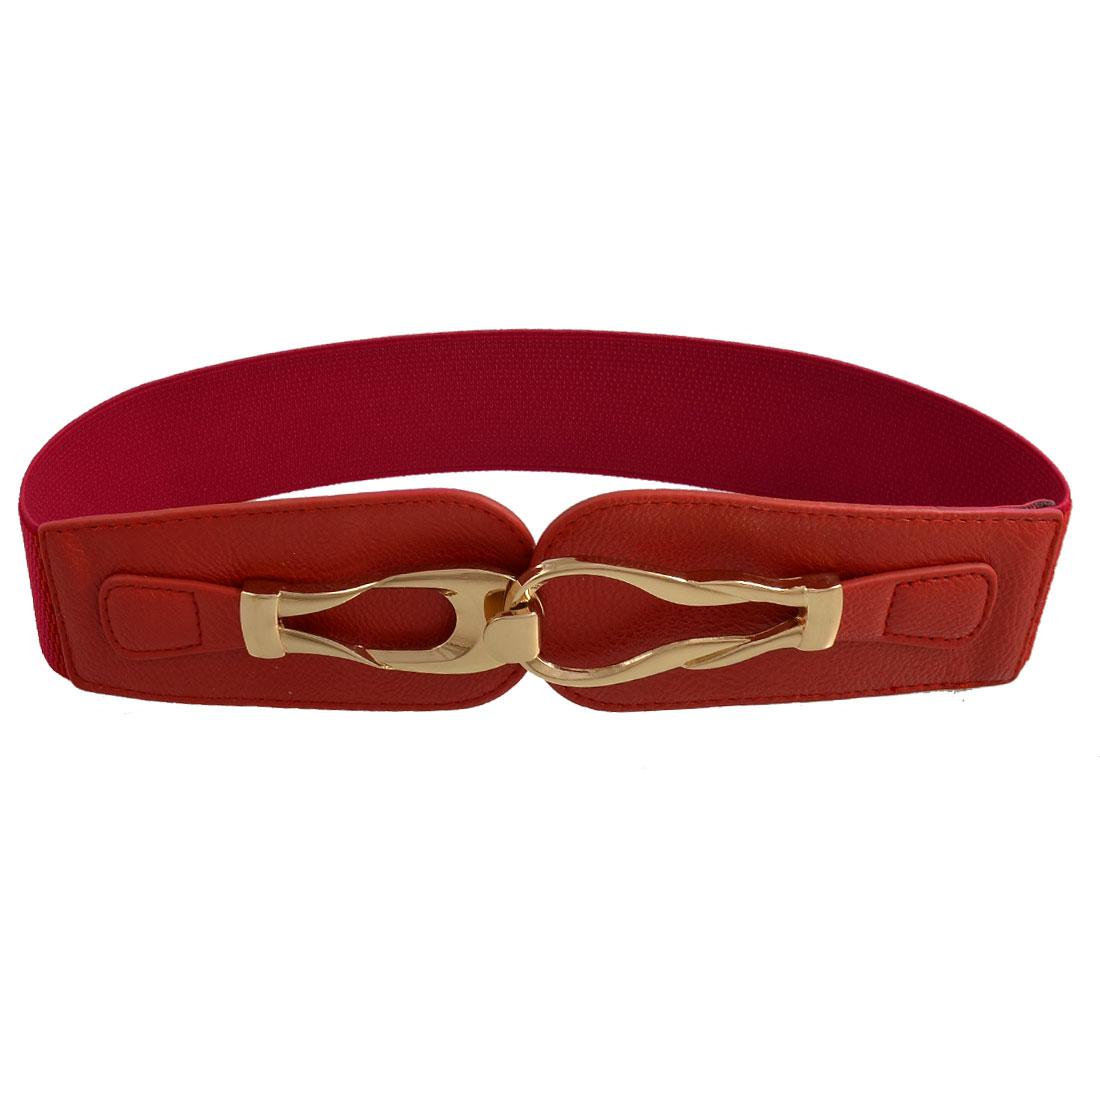 Ladies Metal Hook Buckle Elastic Waist Belt Corset Band Cinch Red